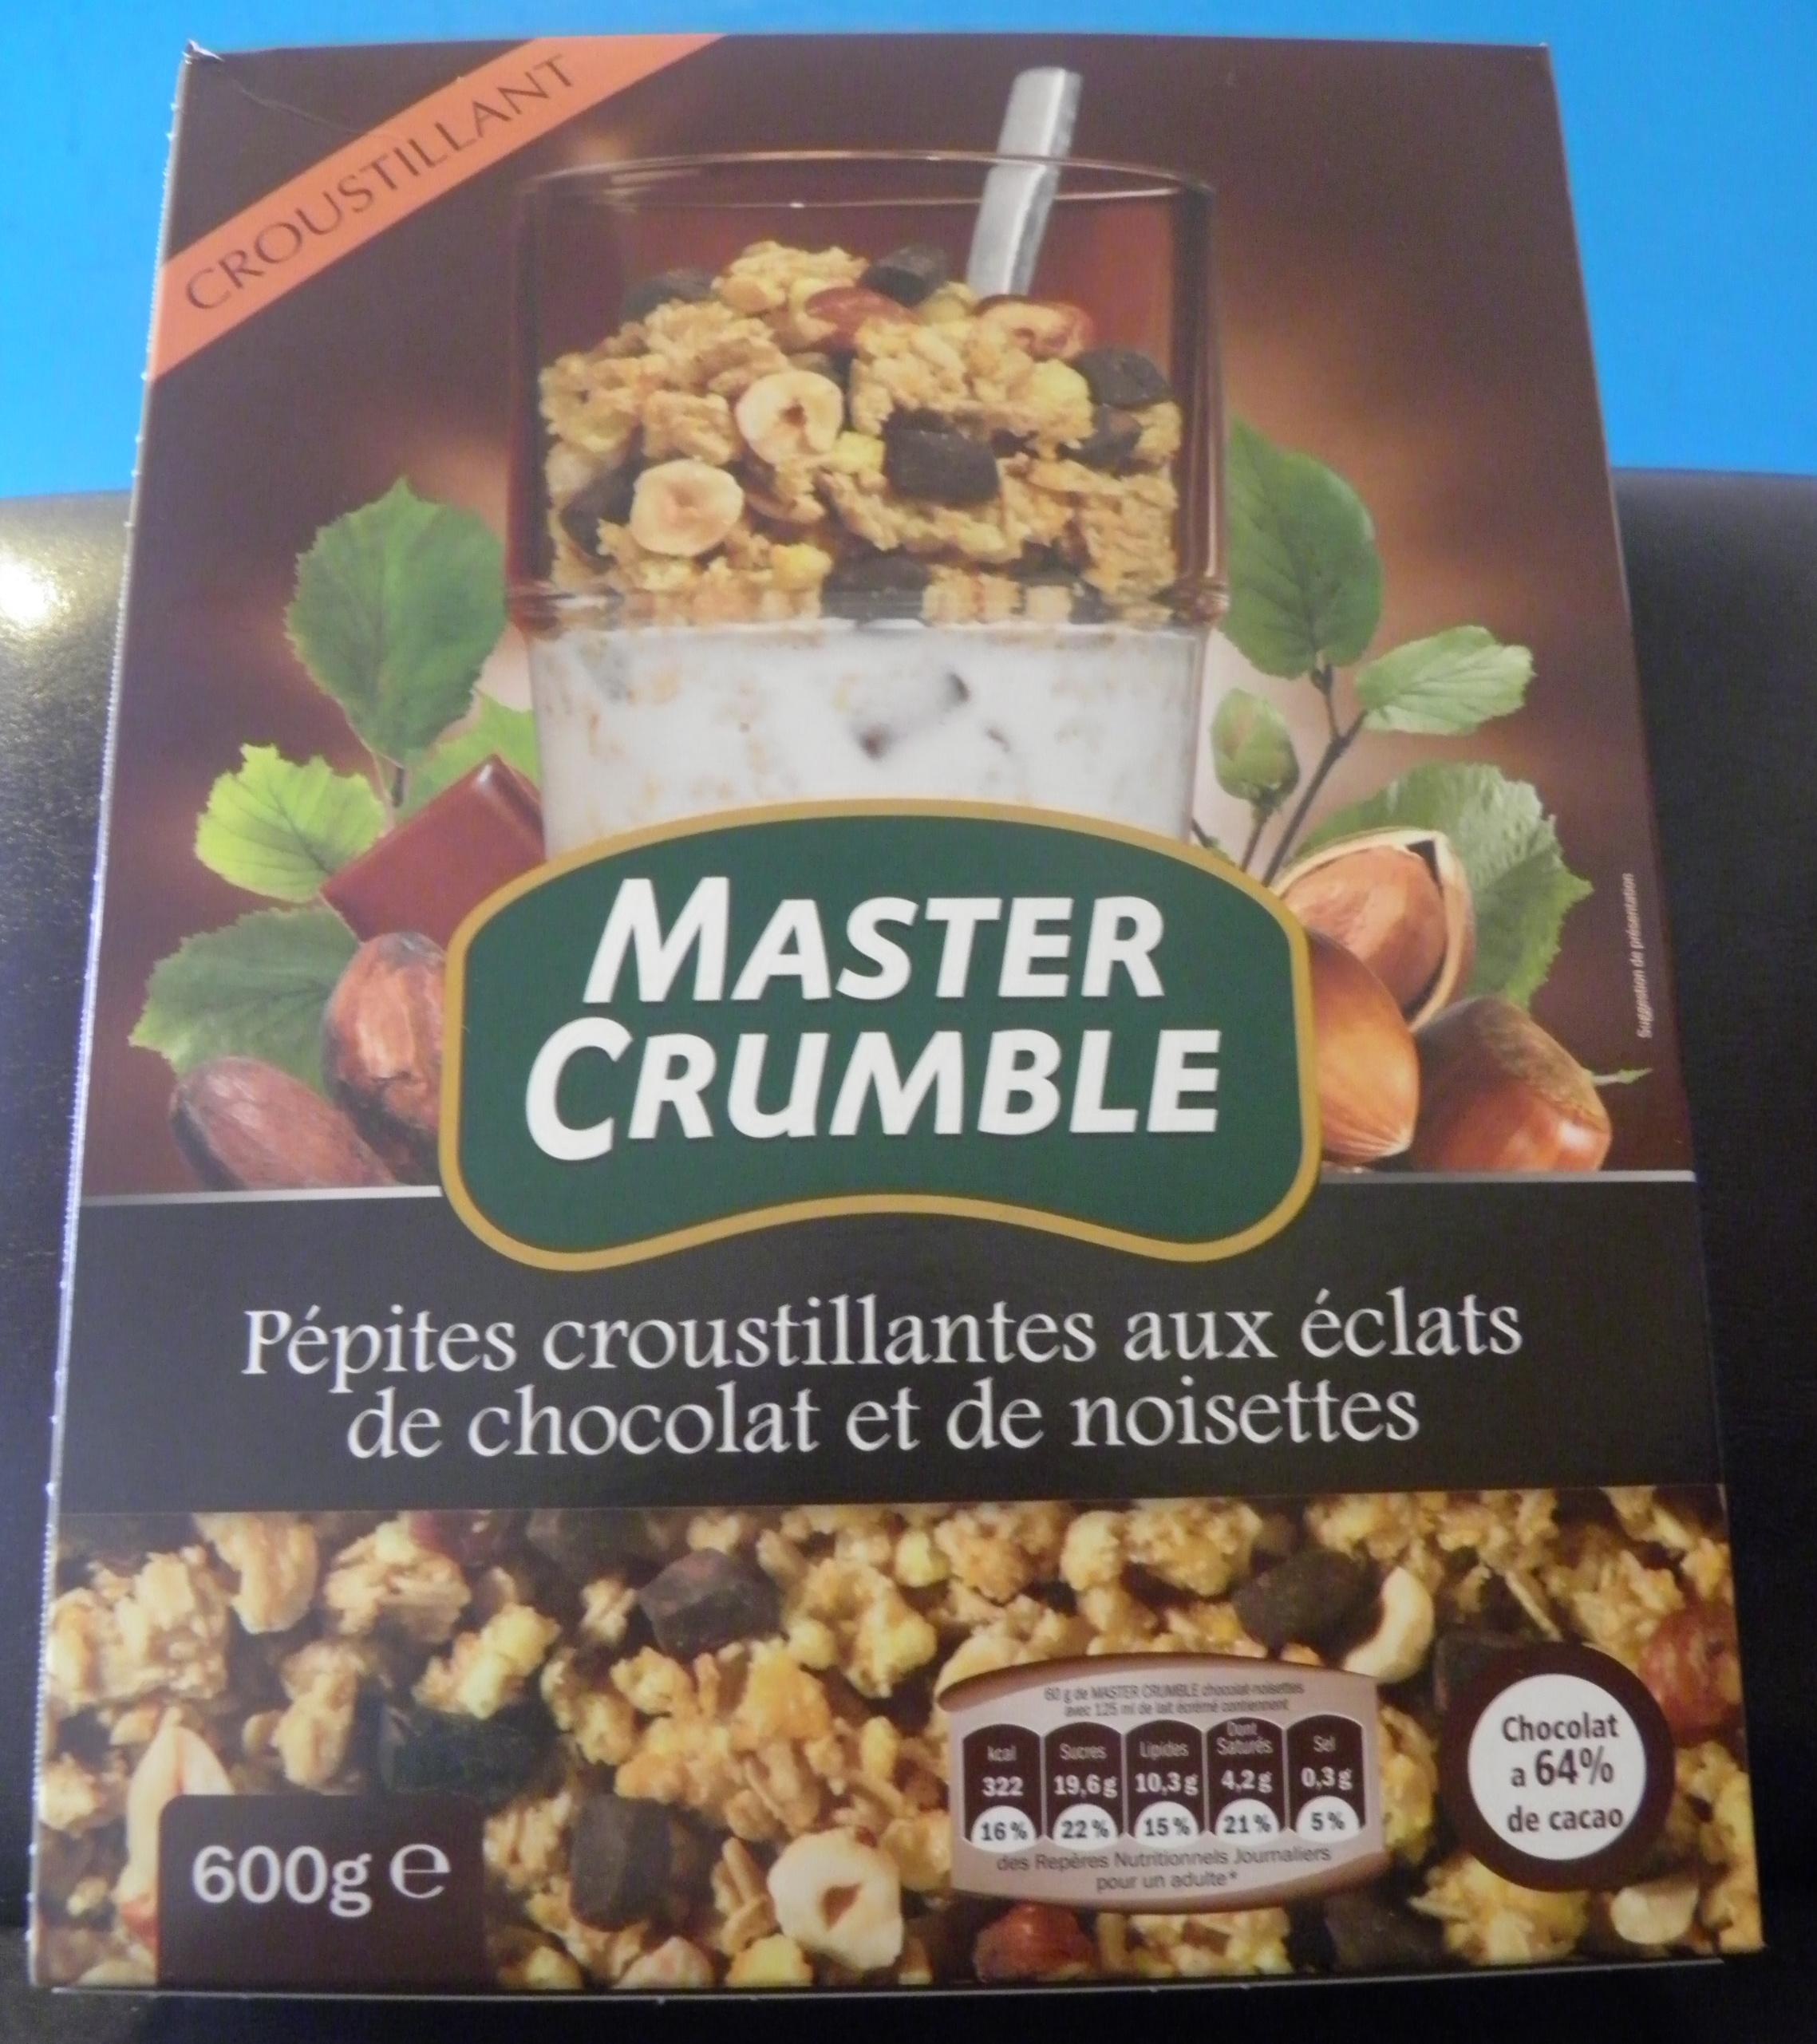 Master crumble chocolat noisette - Product - fr